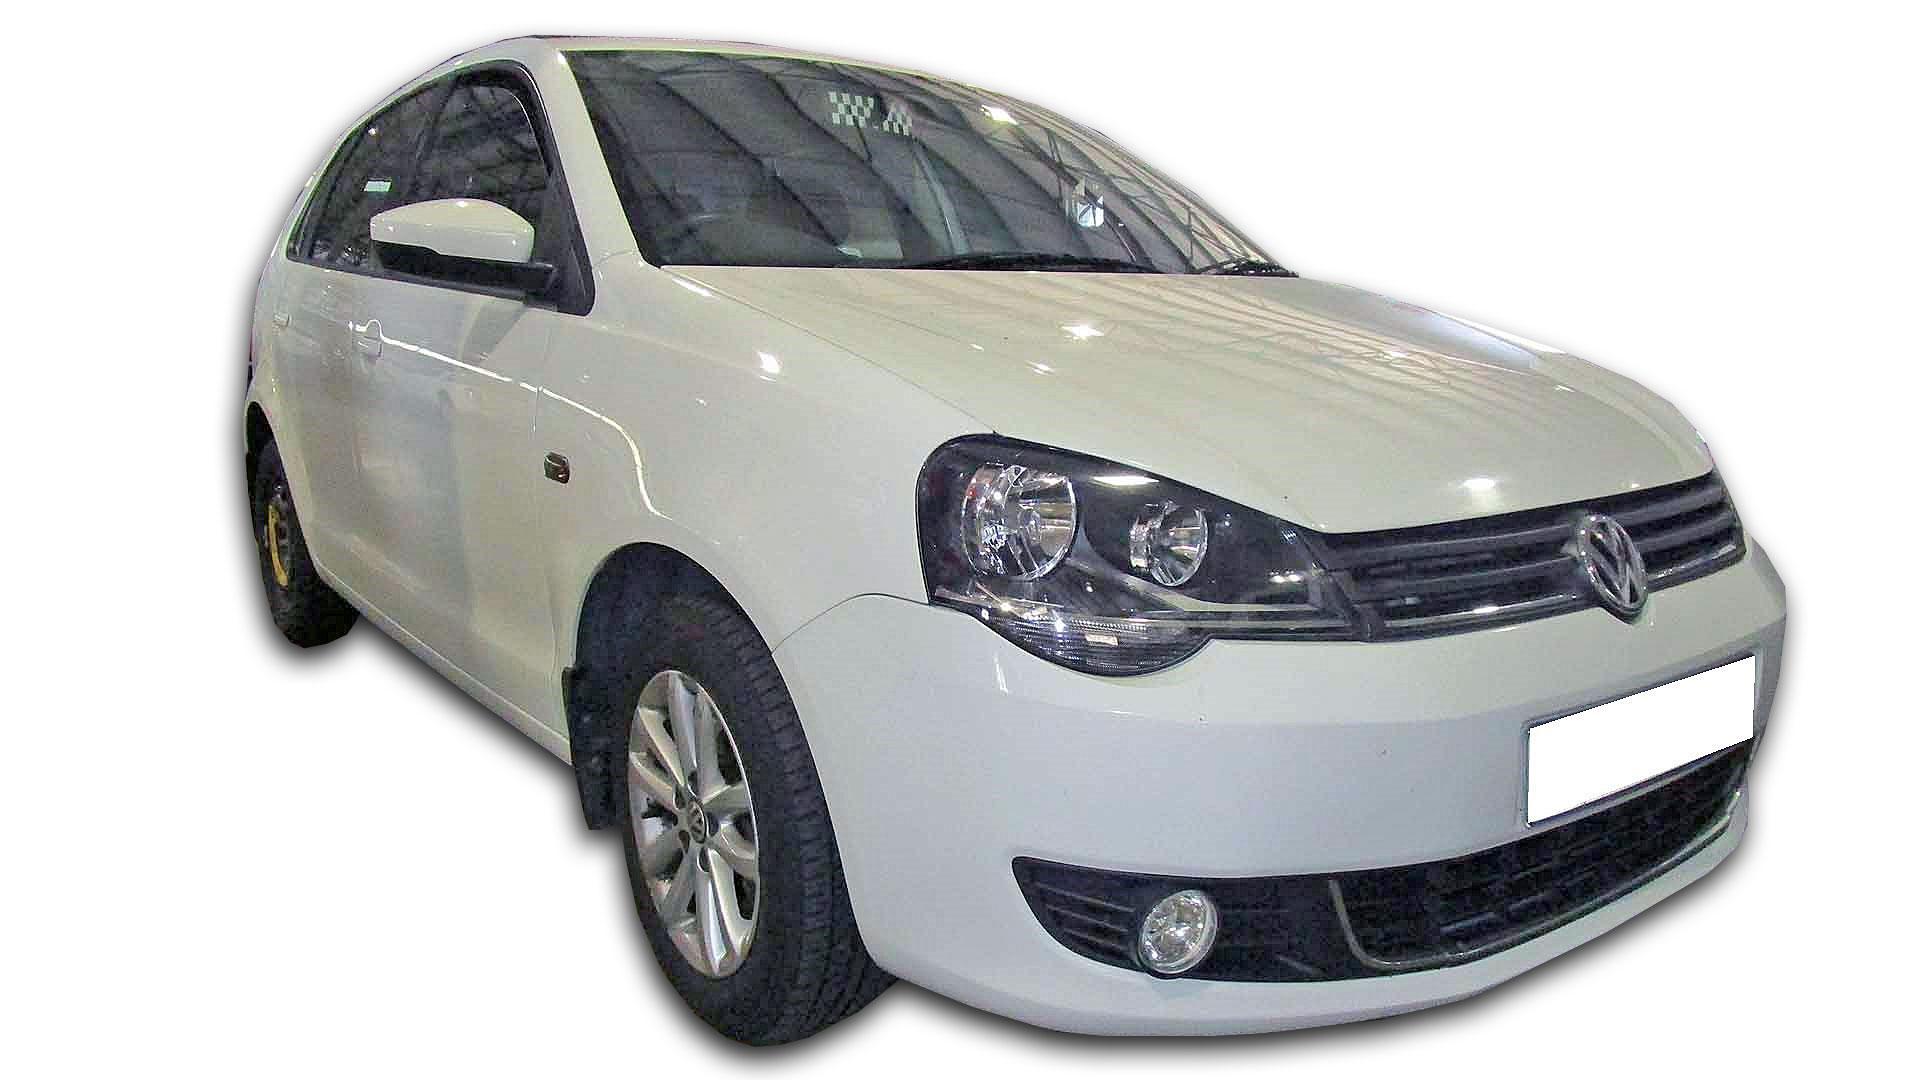 VW Polo Vivo GP 1.4